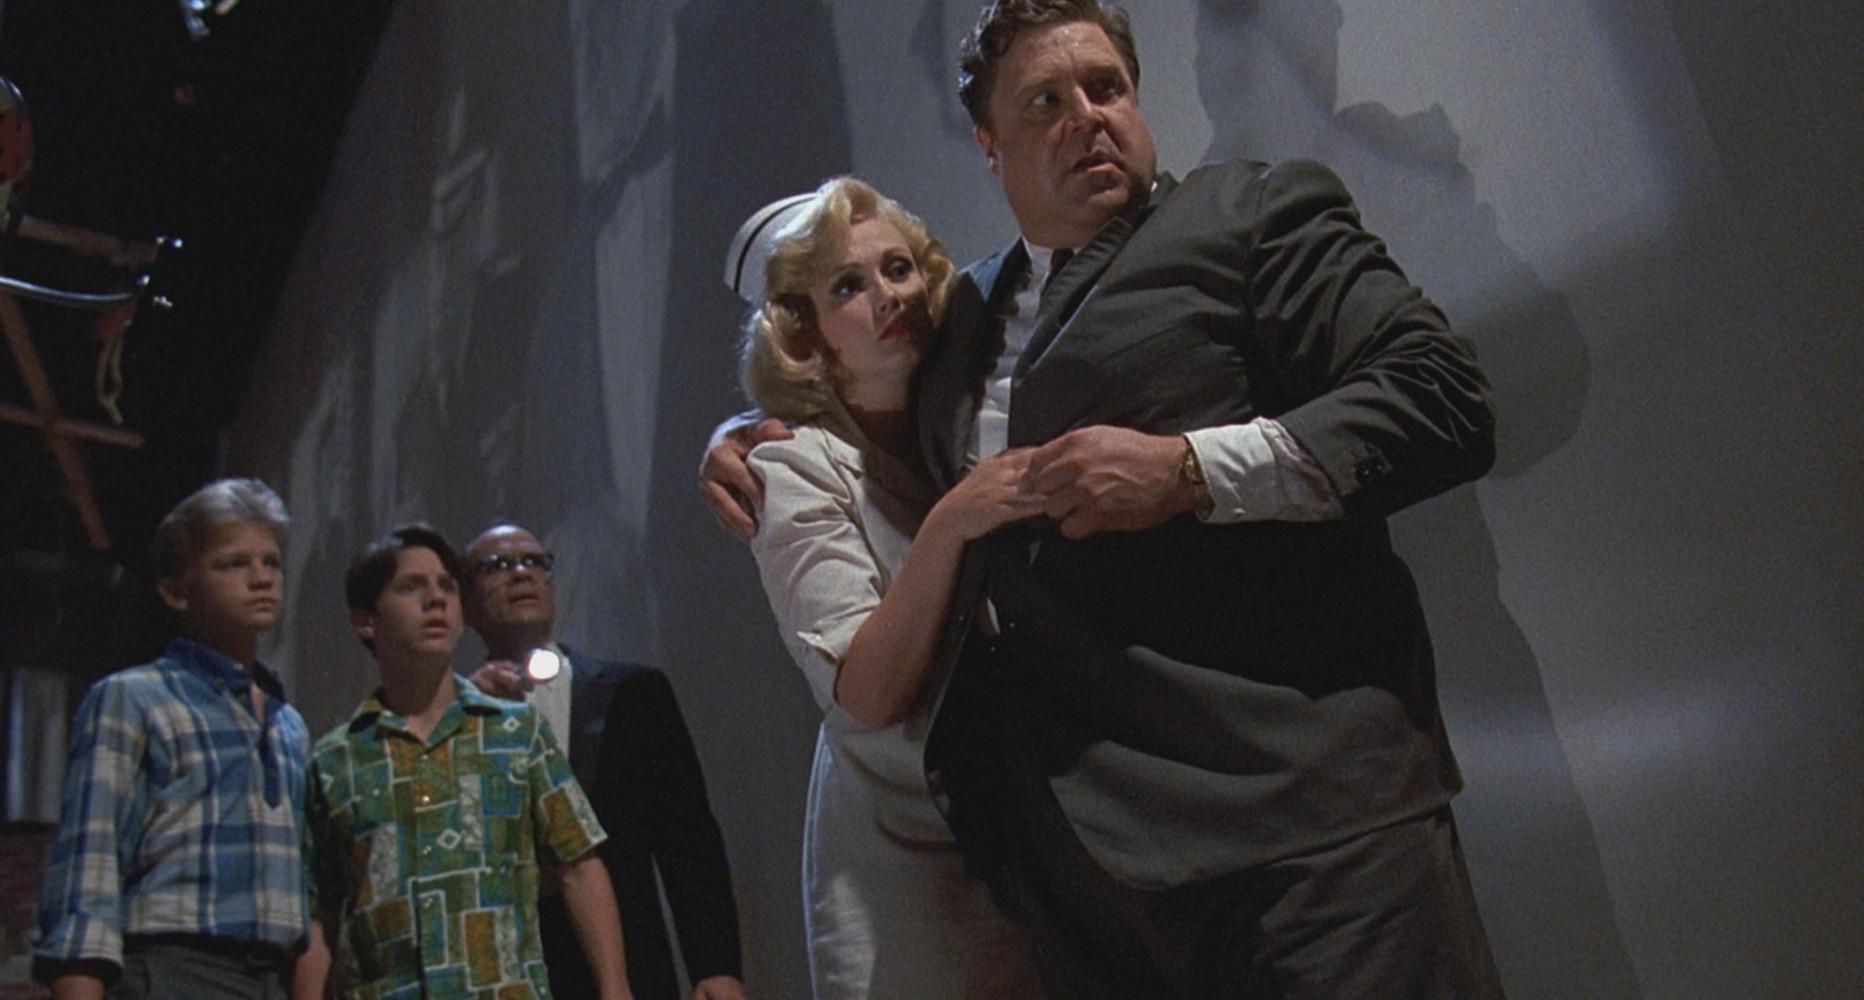 Cathy Moriarty et John Goodman dans Panic sur Florida Beach